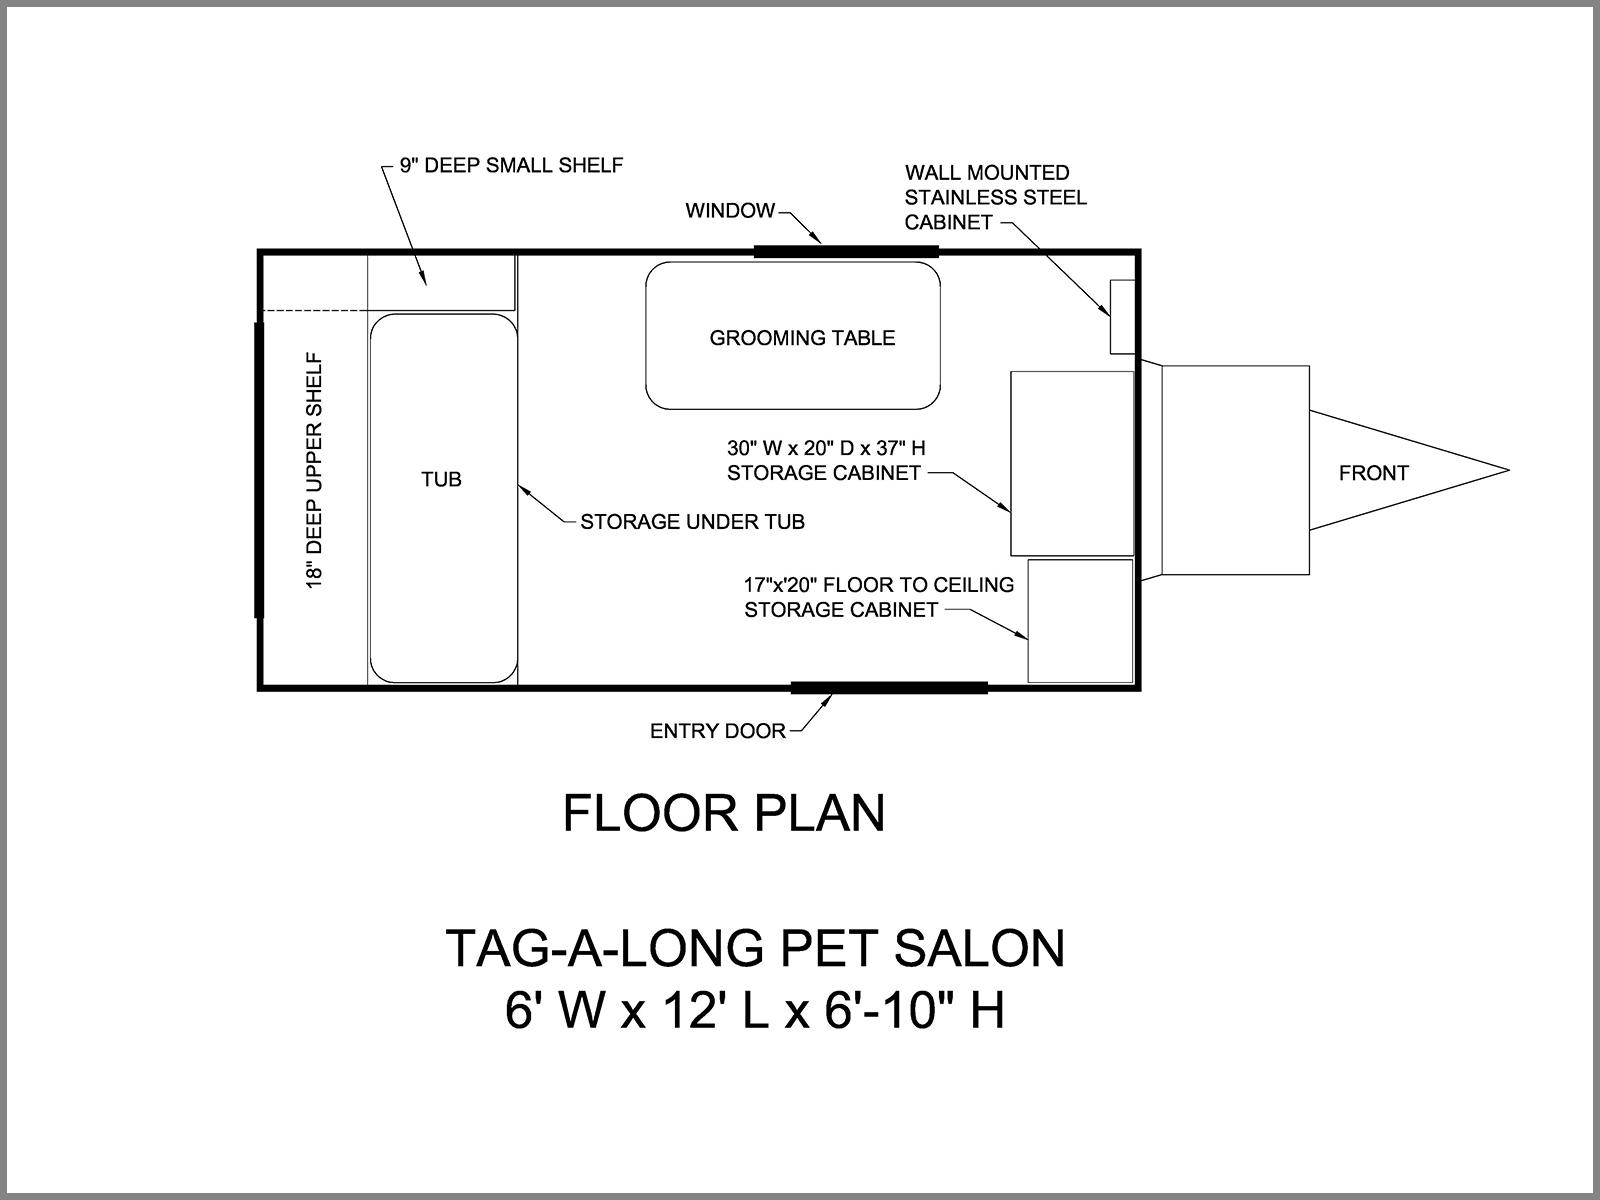 Dog Grooming Trailer-Floor Plan | Dog Grooming | Pinterest | Dog